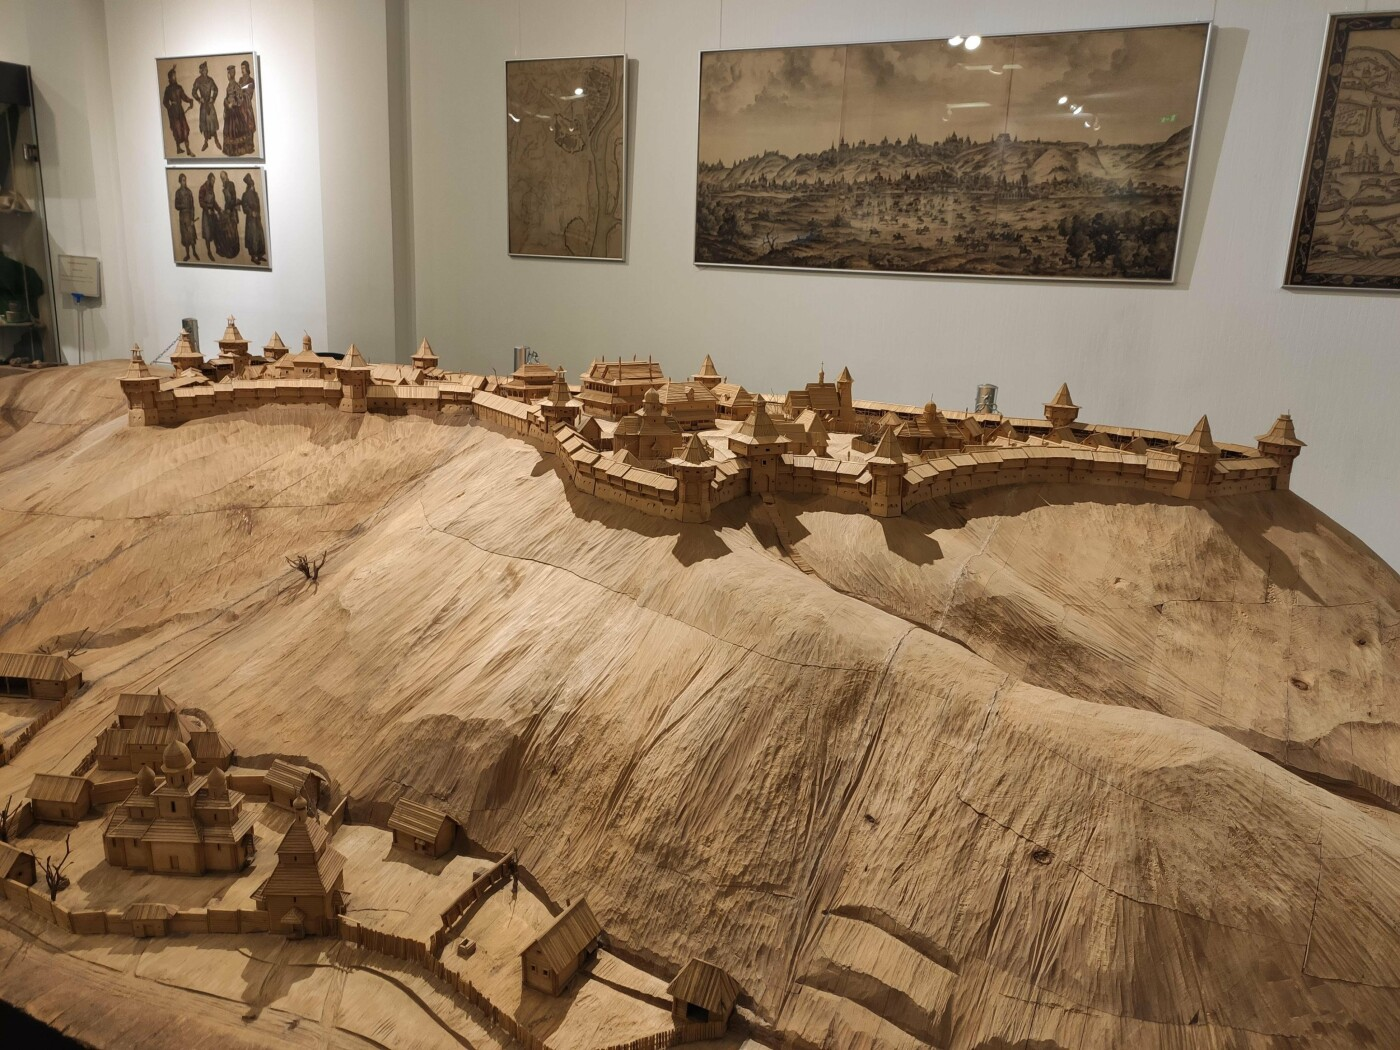 Музей истории Киева, фото: Aleksandr G